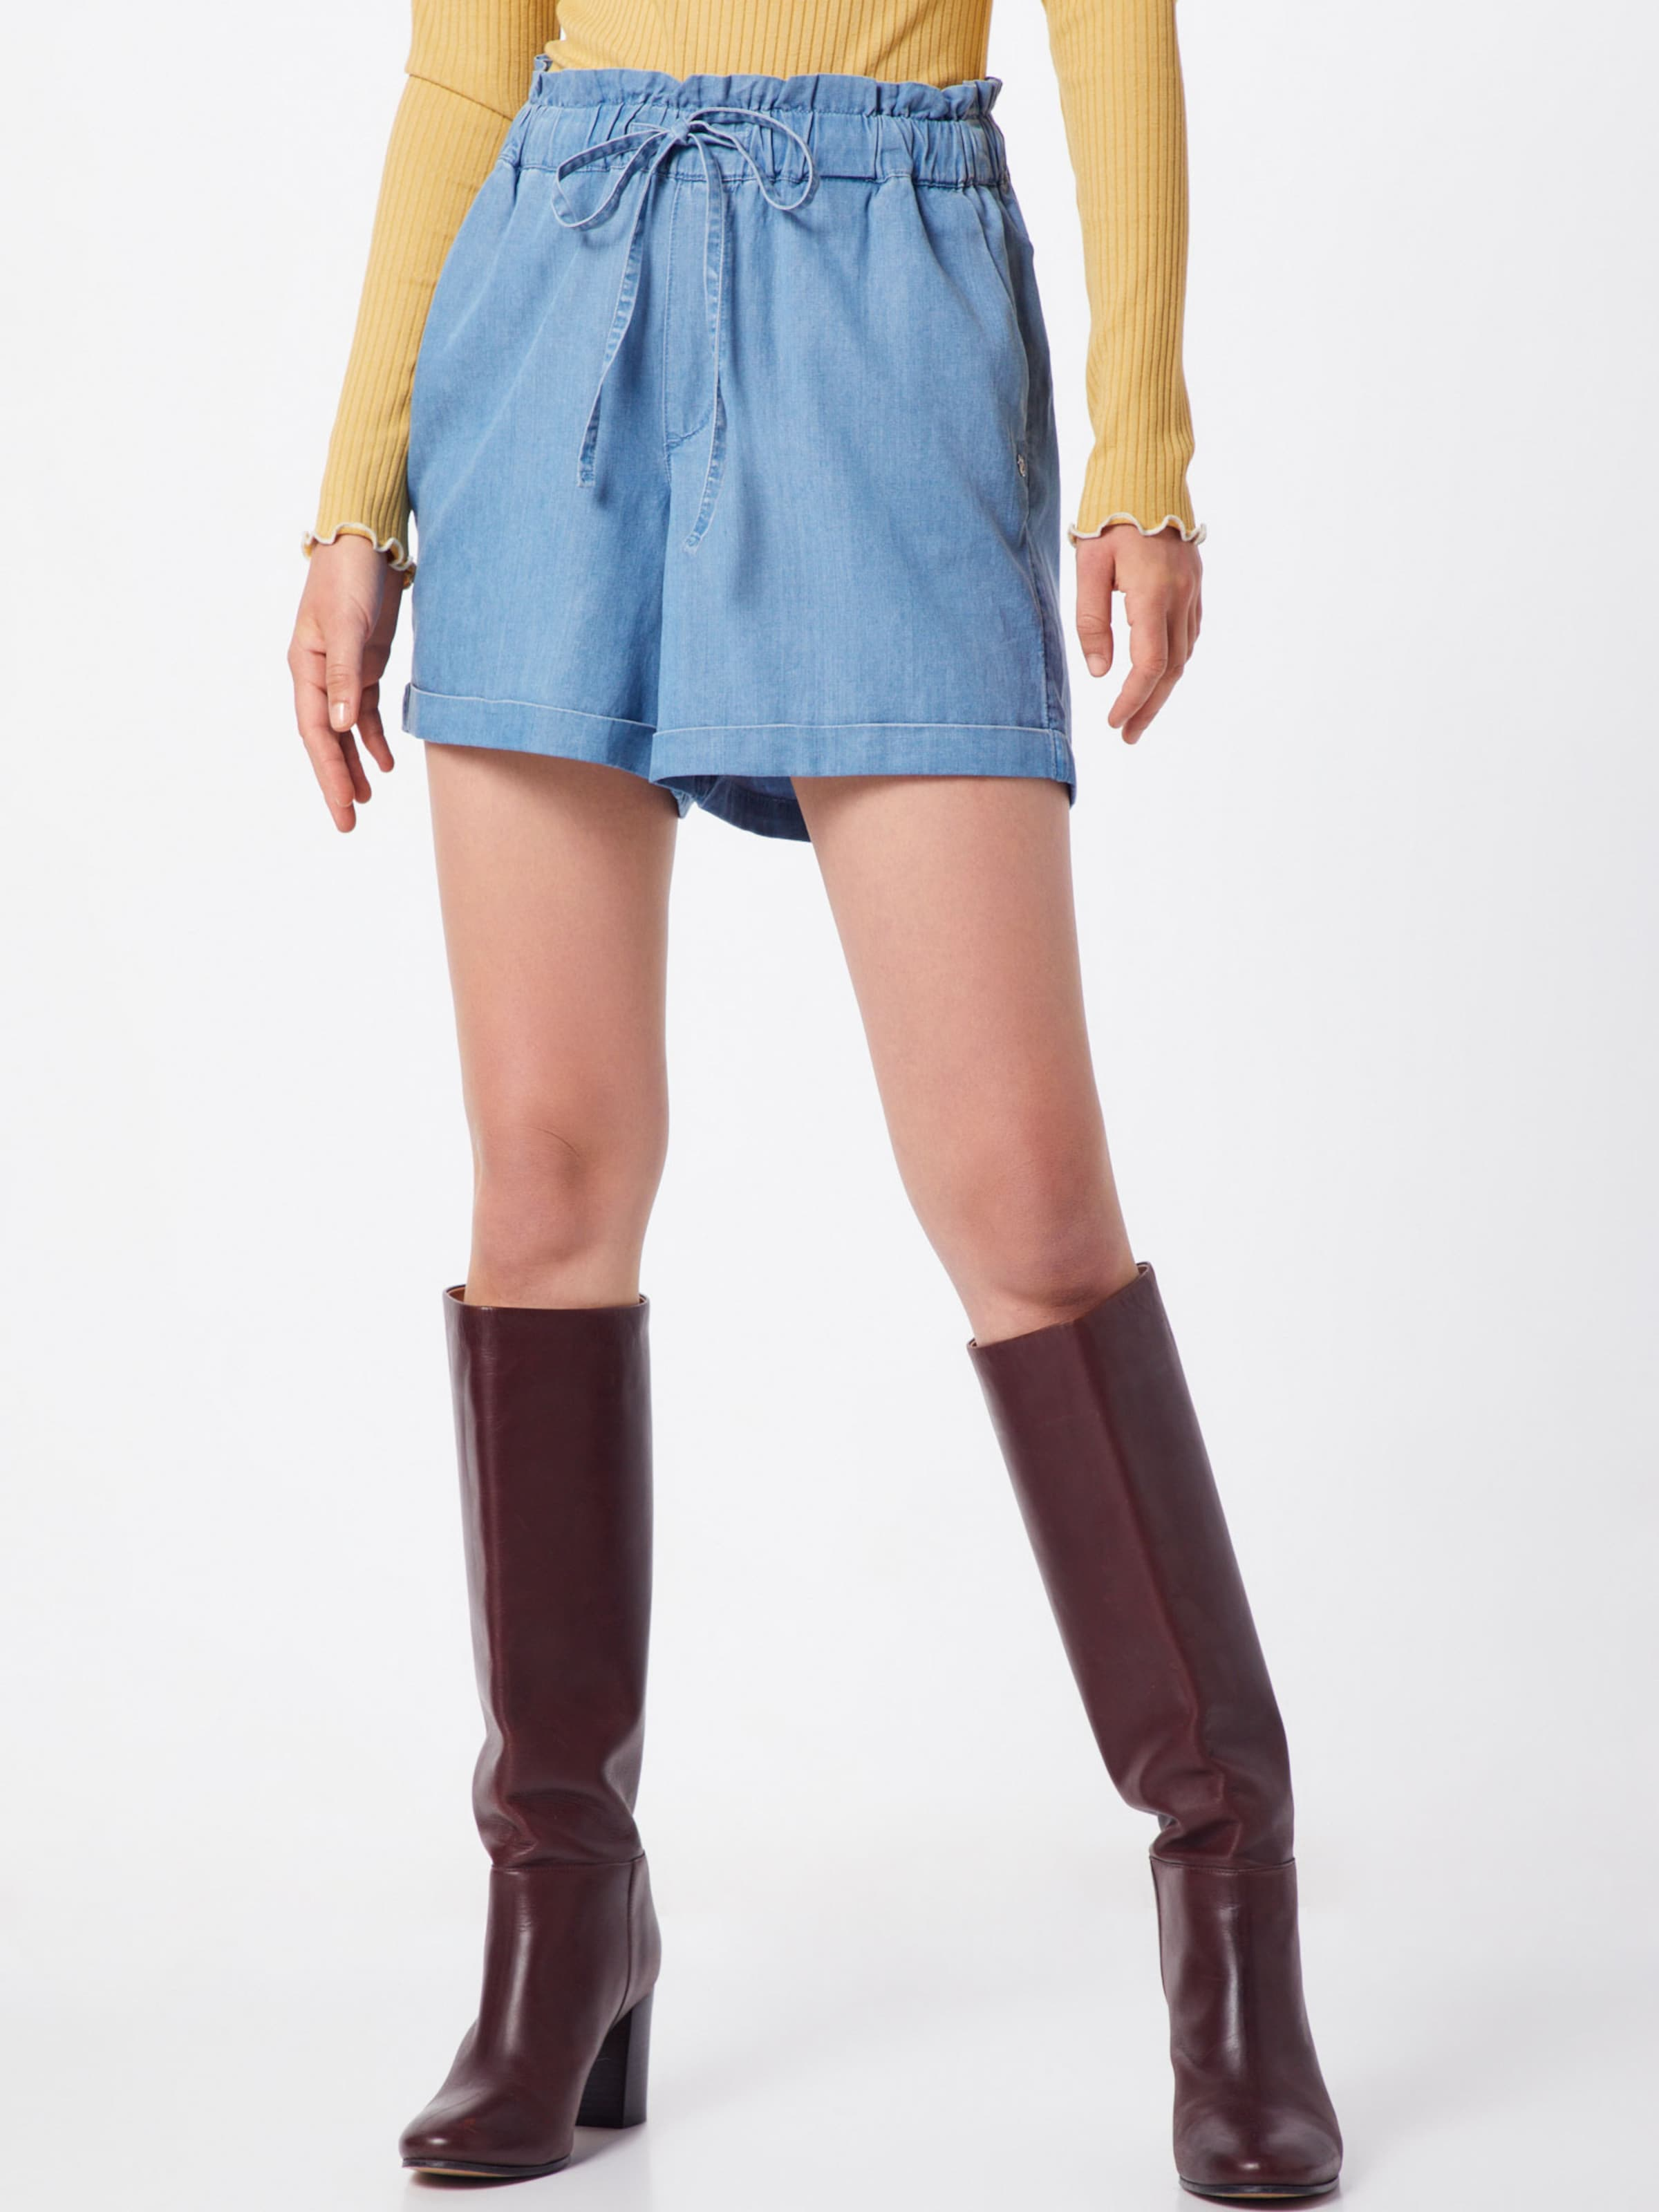 In Shorts Tom Blue Tailor Denim v0PyNnm8wO